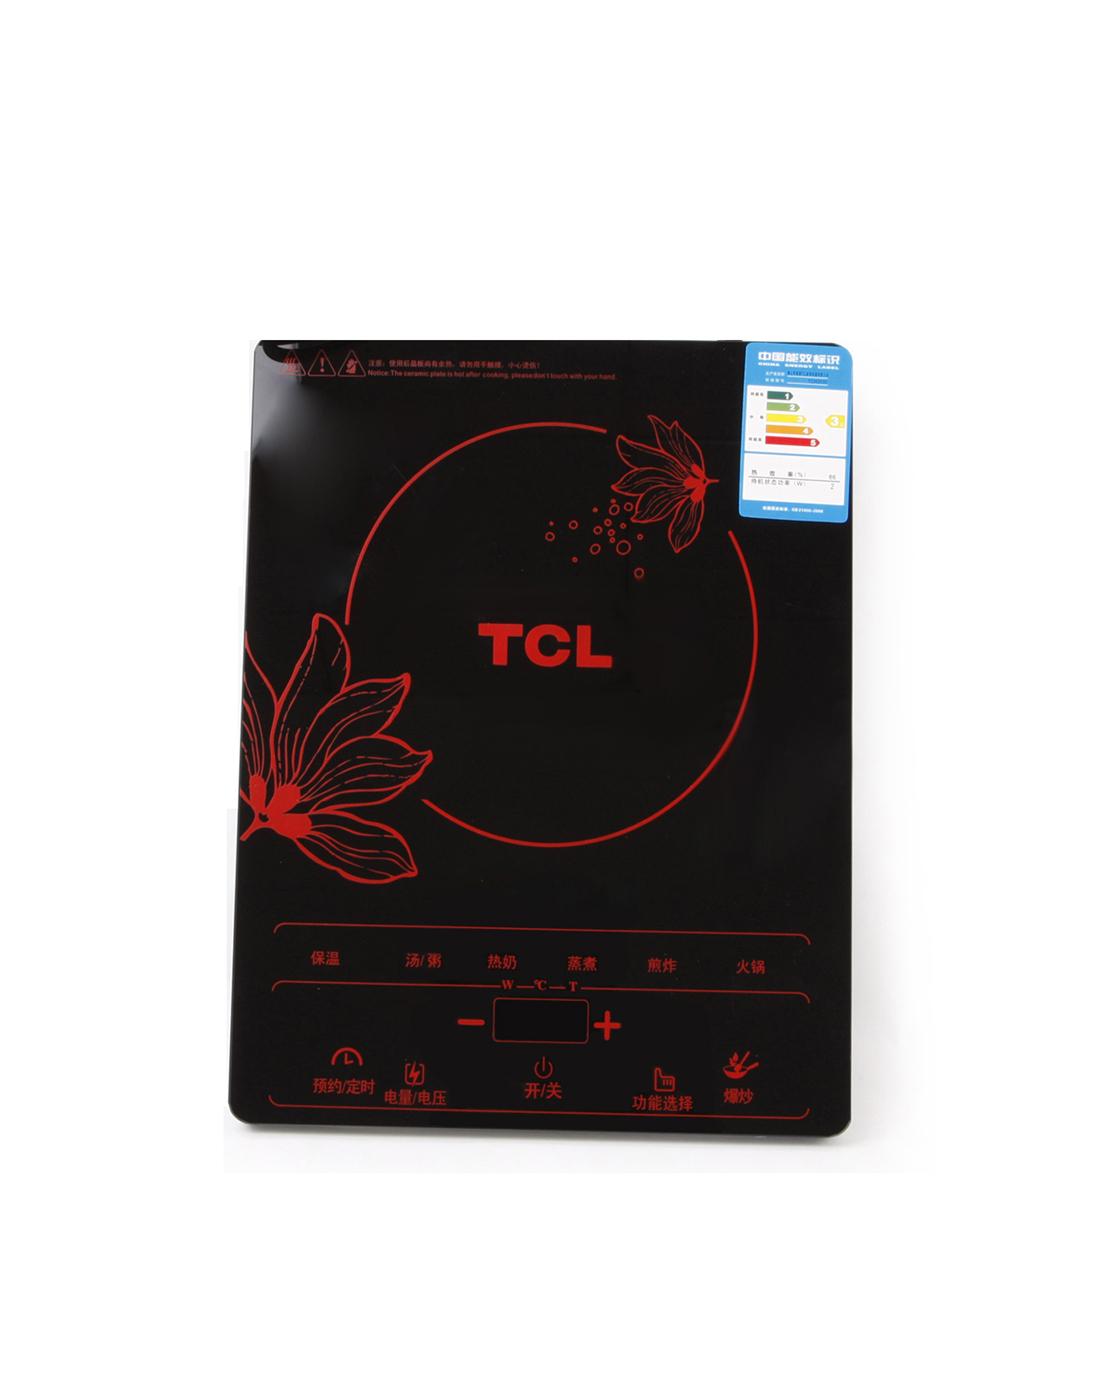 tcl电器&乐心秤tcl 整板触摸式电磁炉tch2030